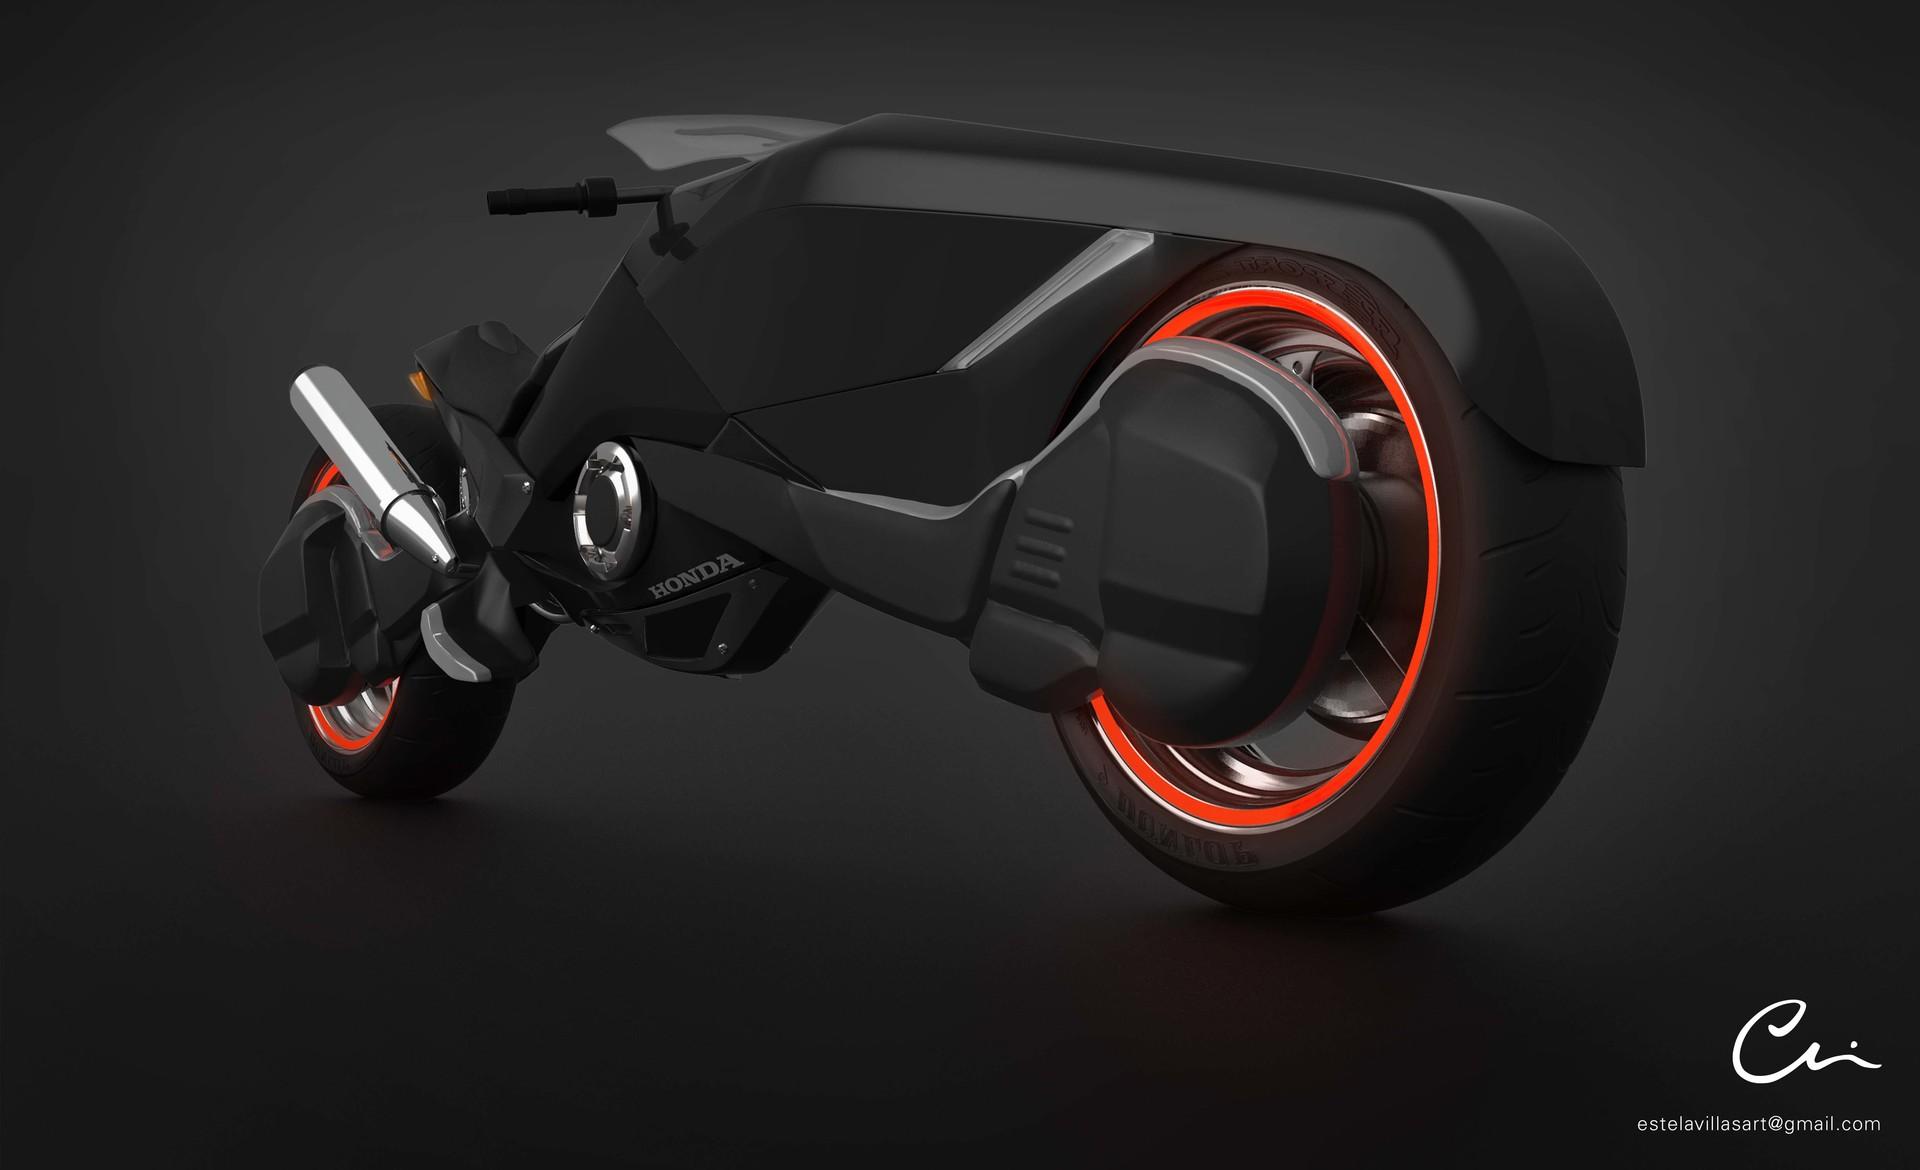 мотоциклы будущего картинки на телефон